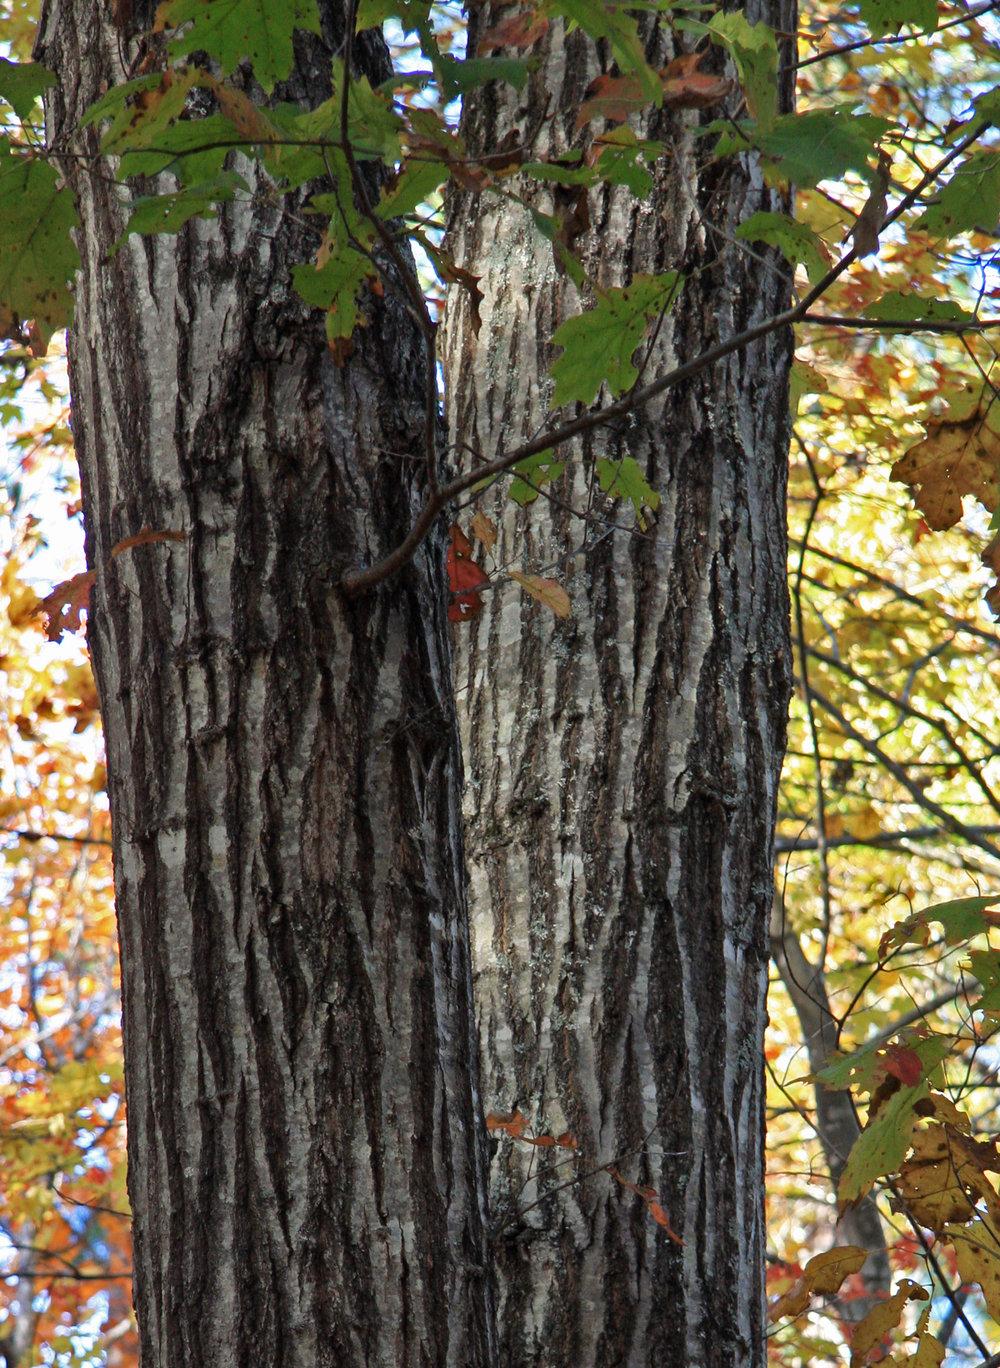 Quercus_rubra_N_red_oak_bark.jpg